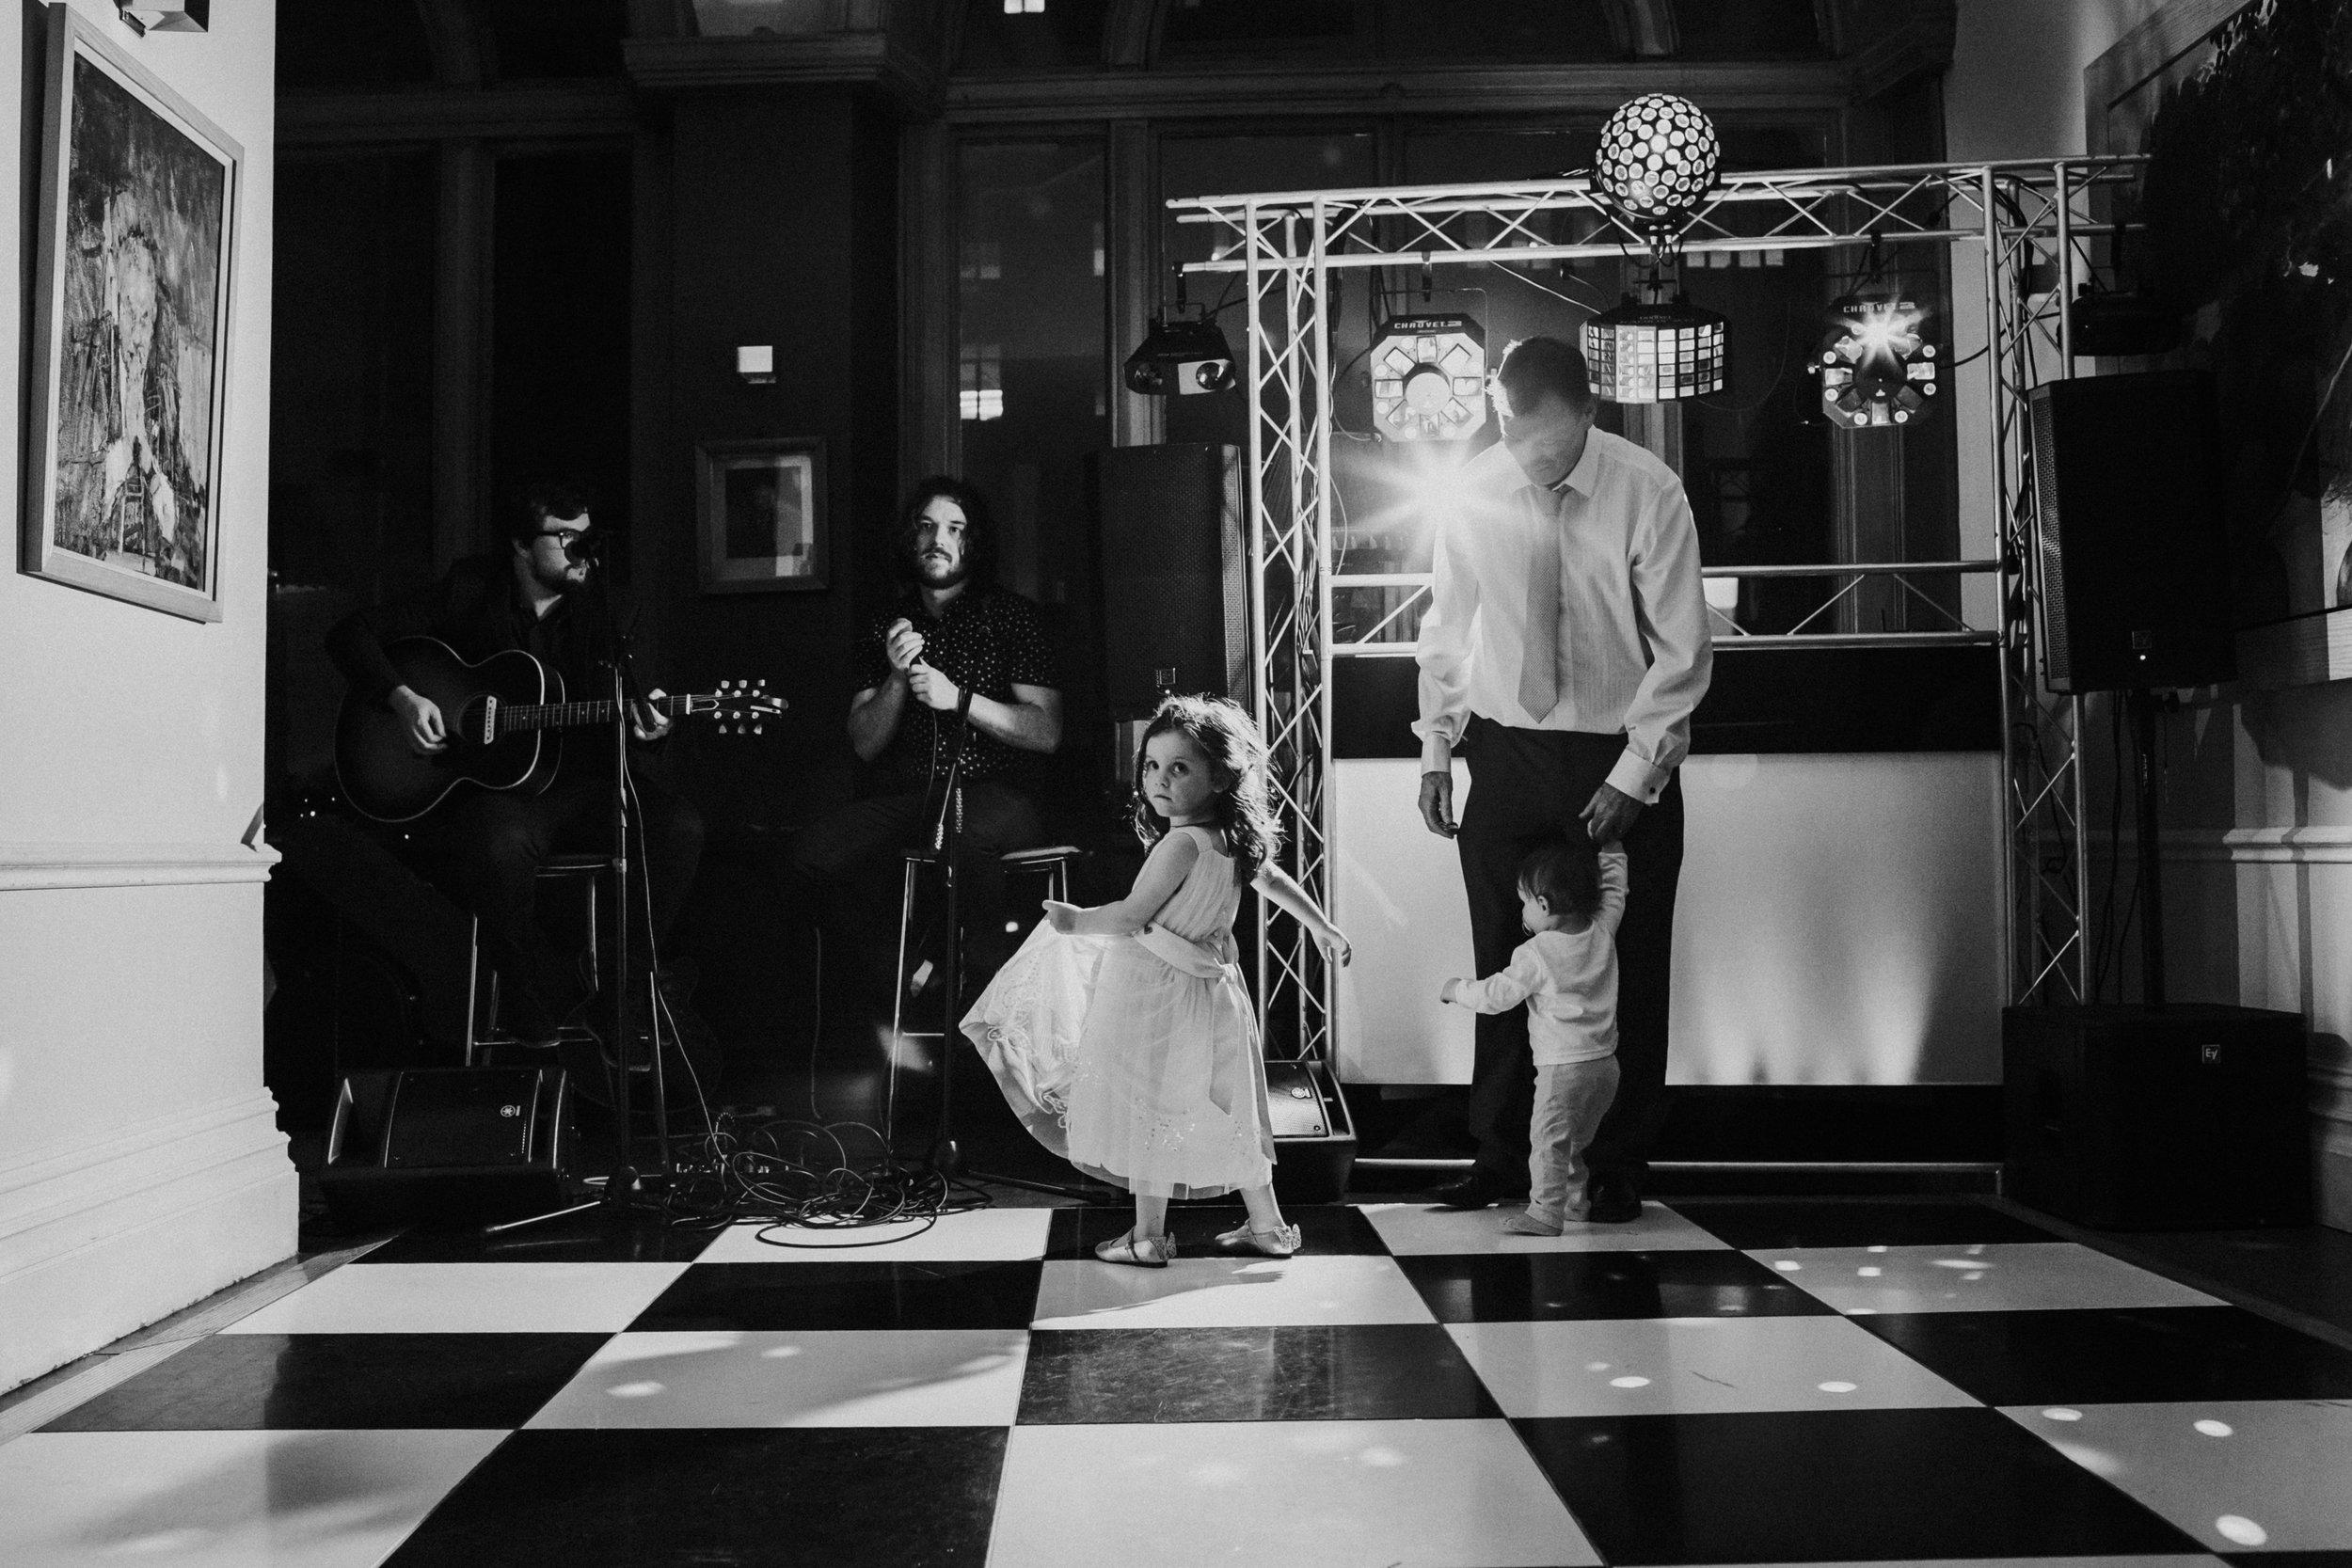 Little girl dancing on dance floor